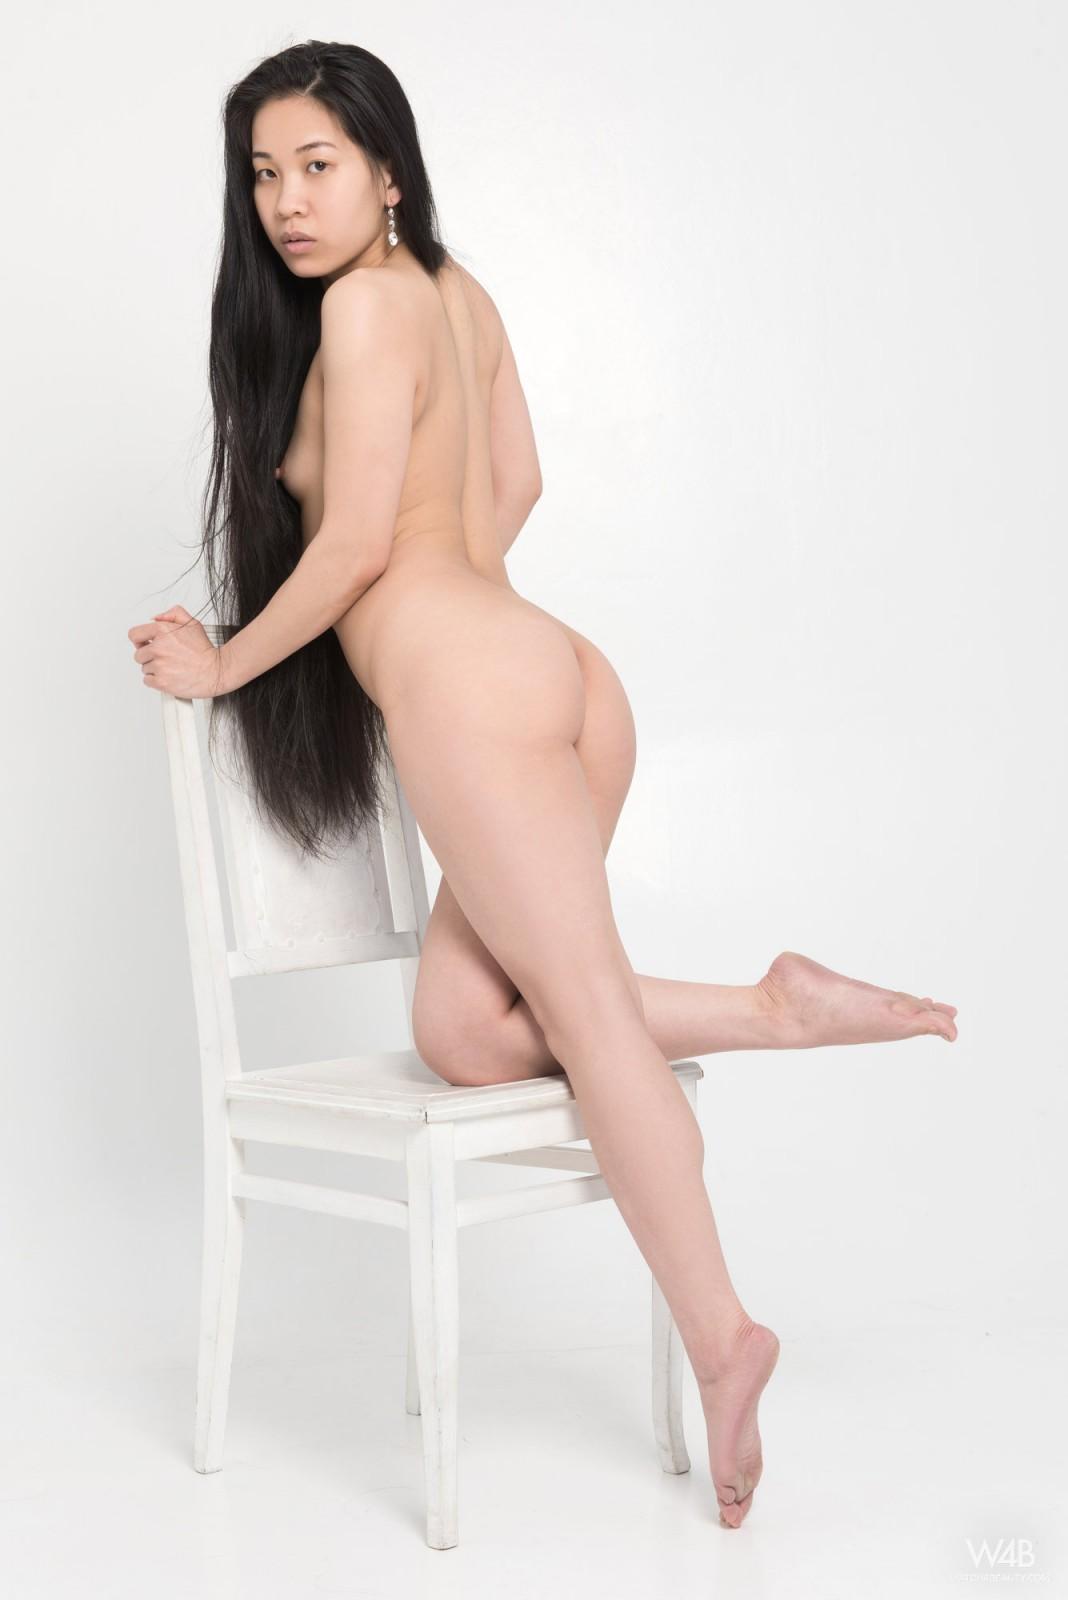 Models asian nude Vietnamese model's